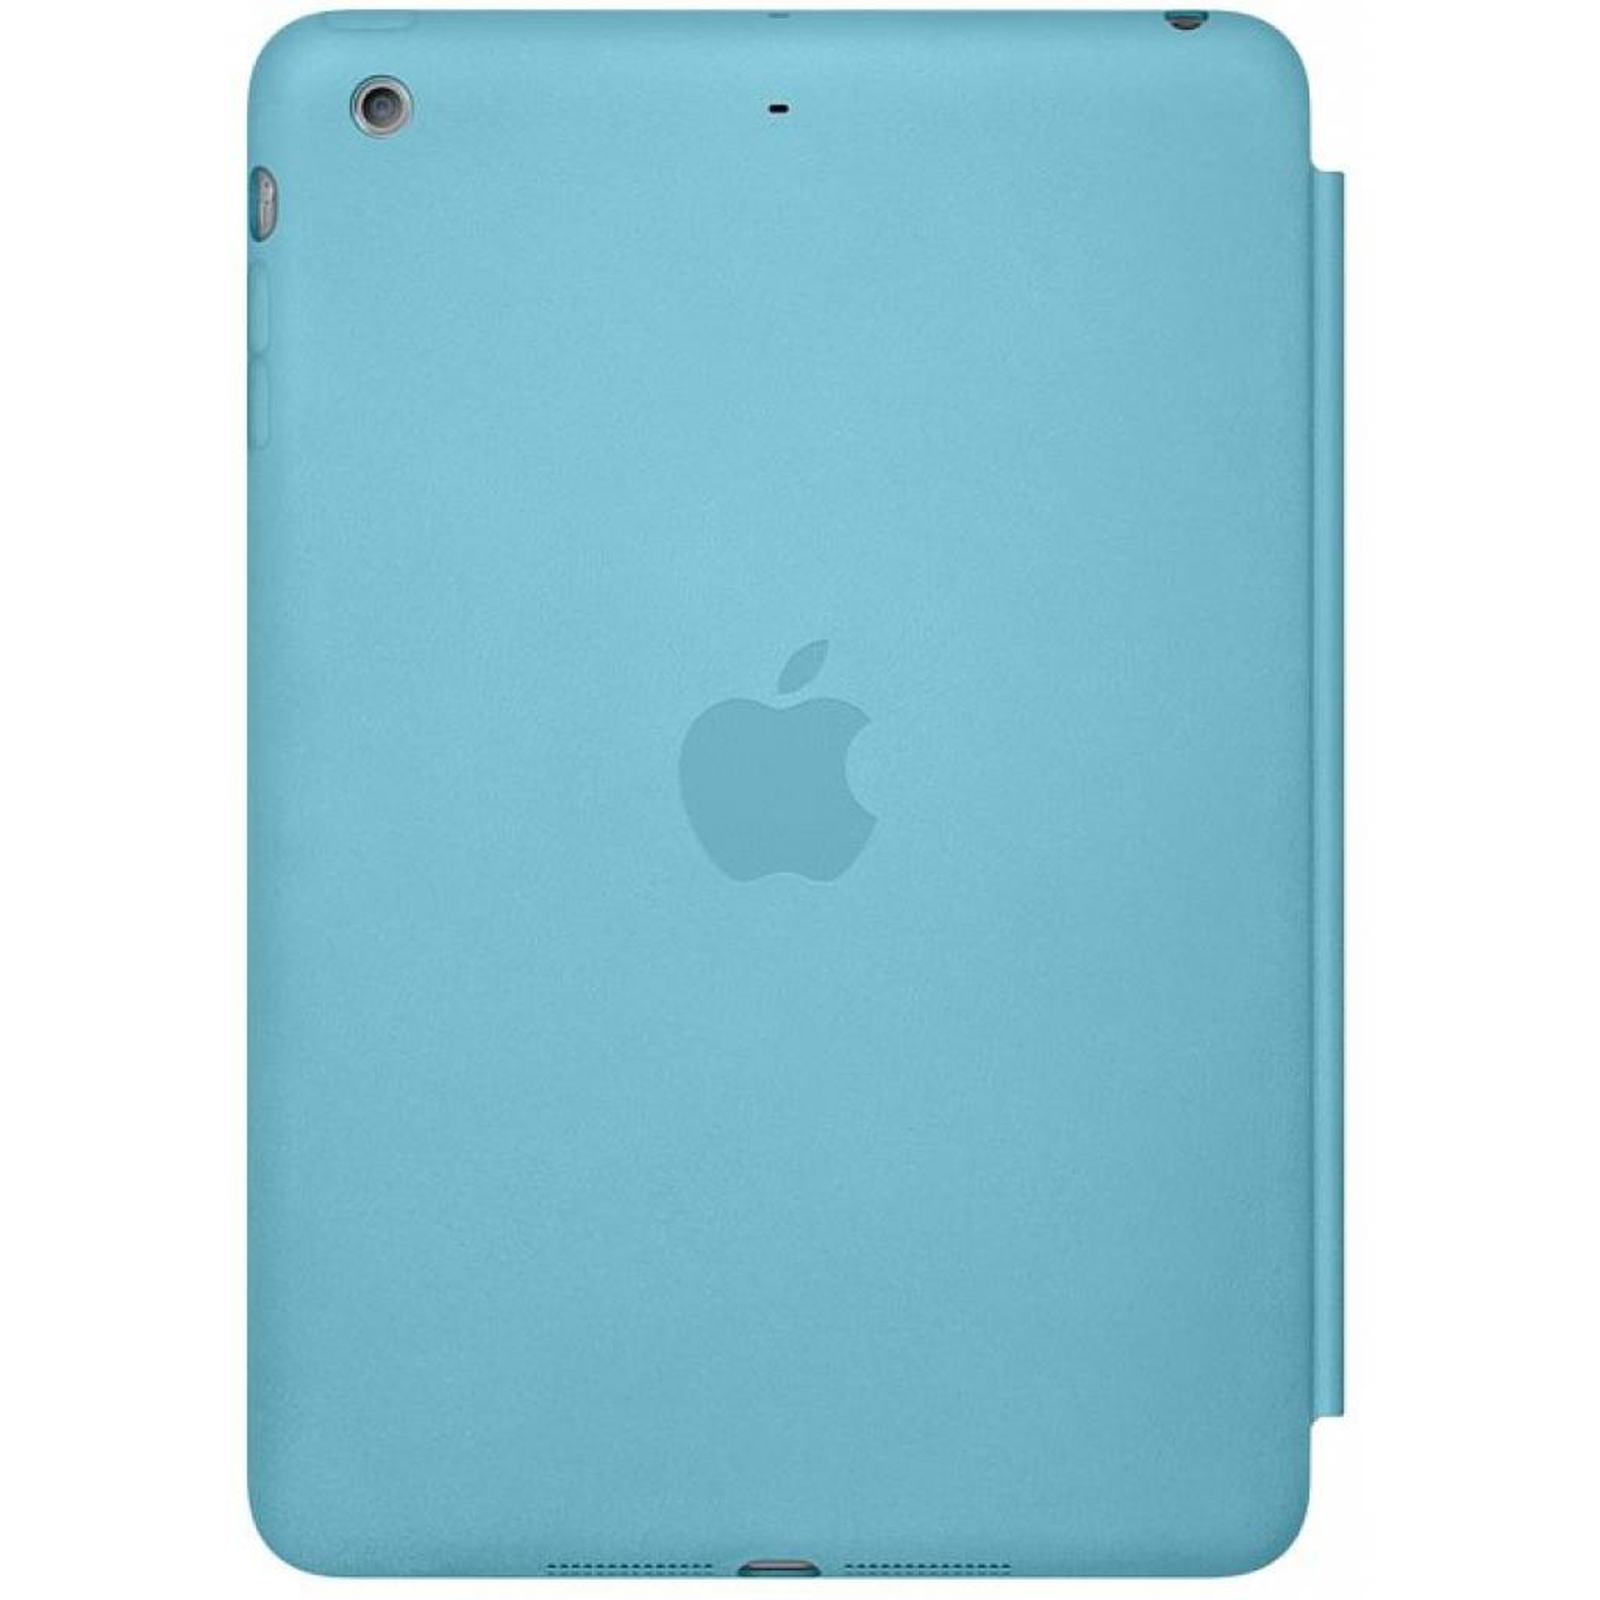 Чехол для планшета Apple Smart Case для iPad mini /blue (ME709ZM/A) изображение 2